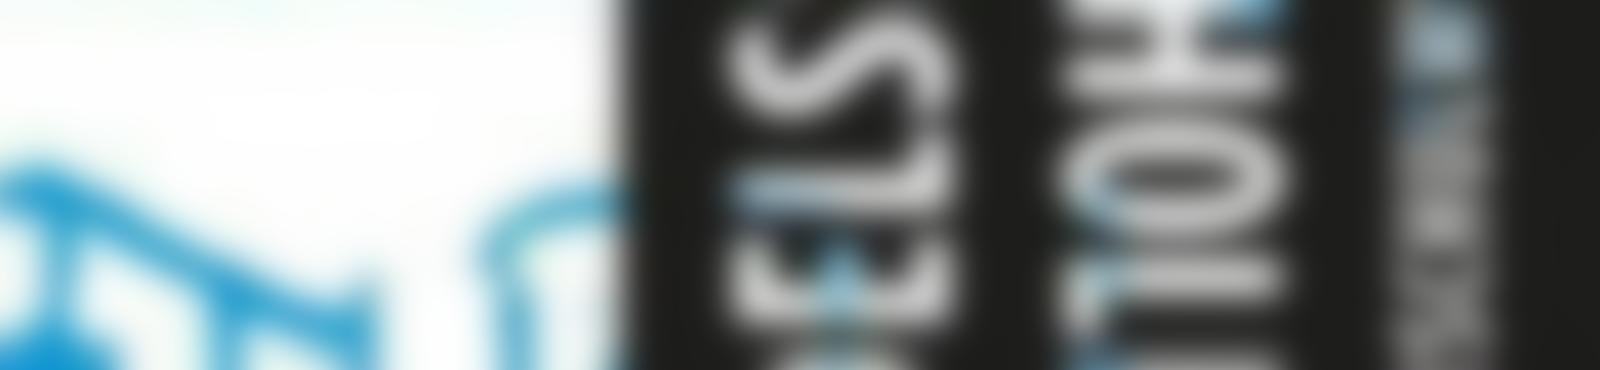 Blurred e18bf0ea 7f1d 49c2 95b8 85e112a336ab